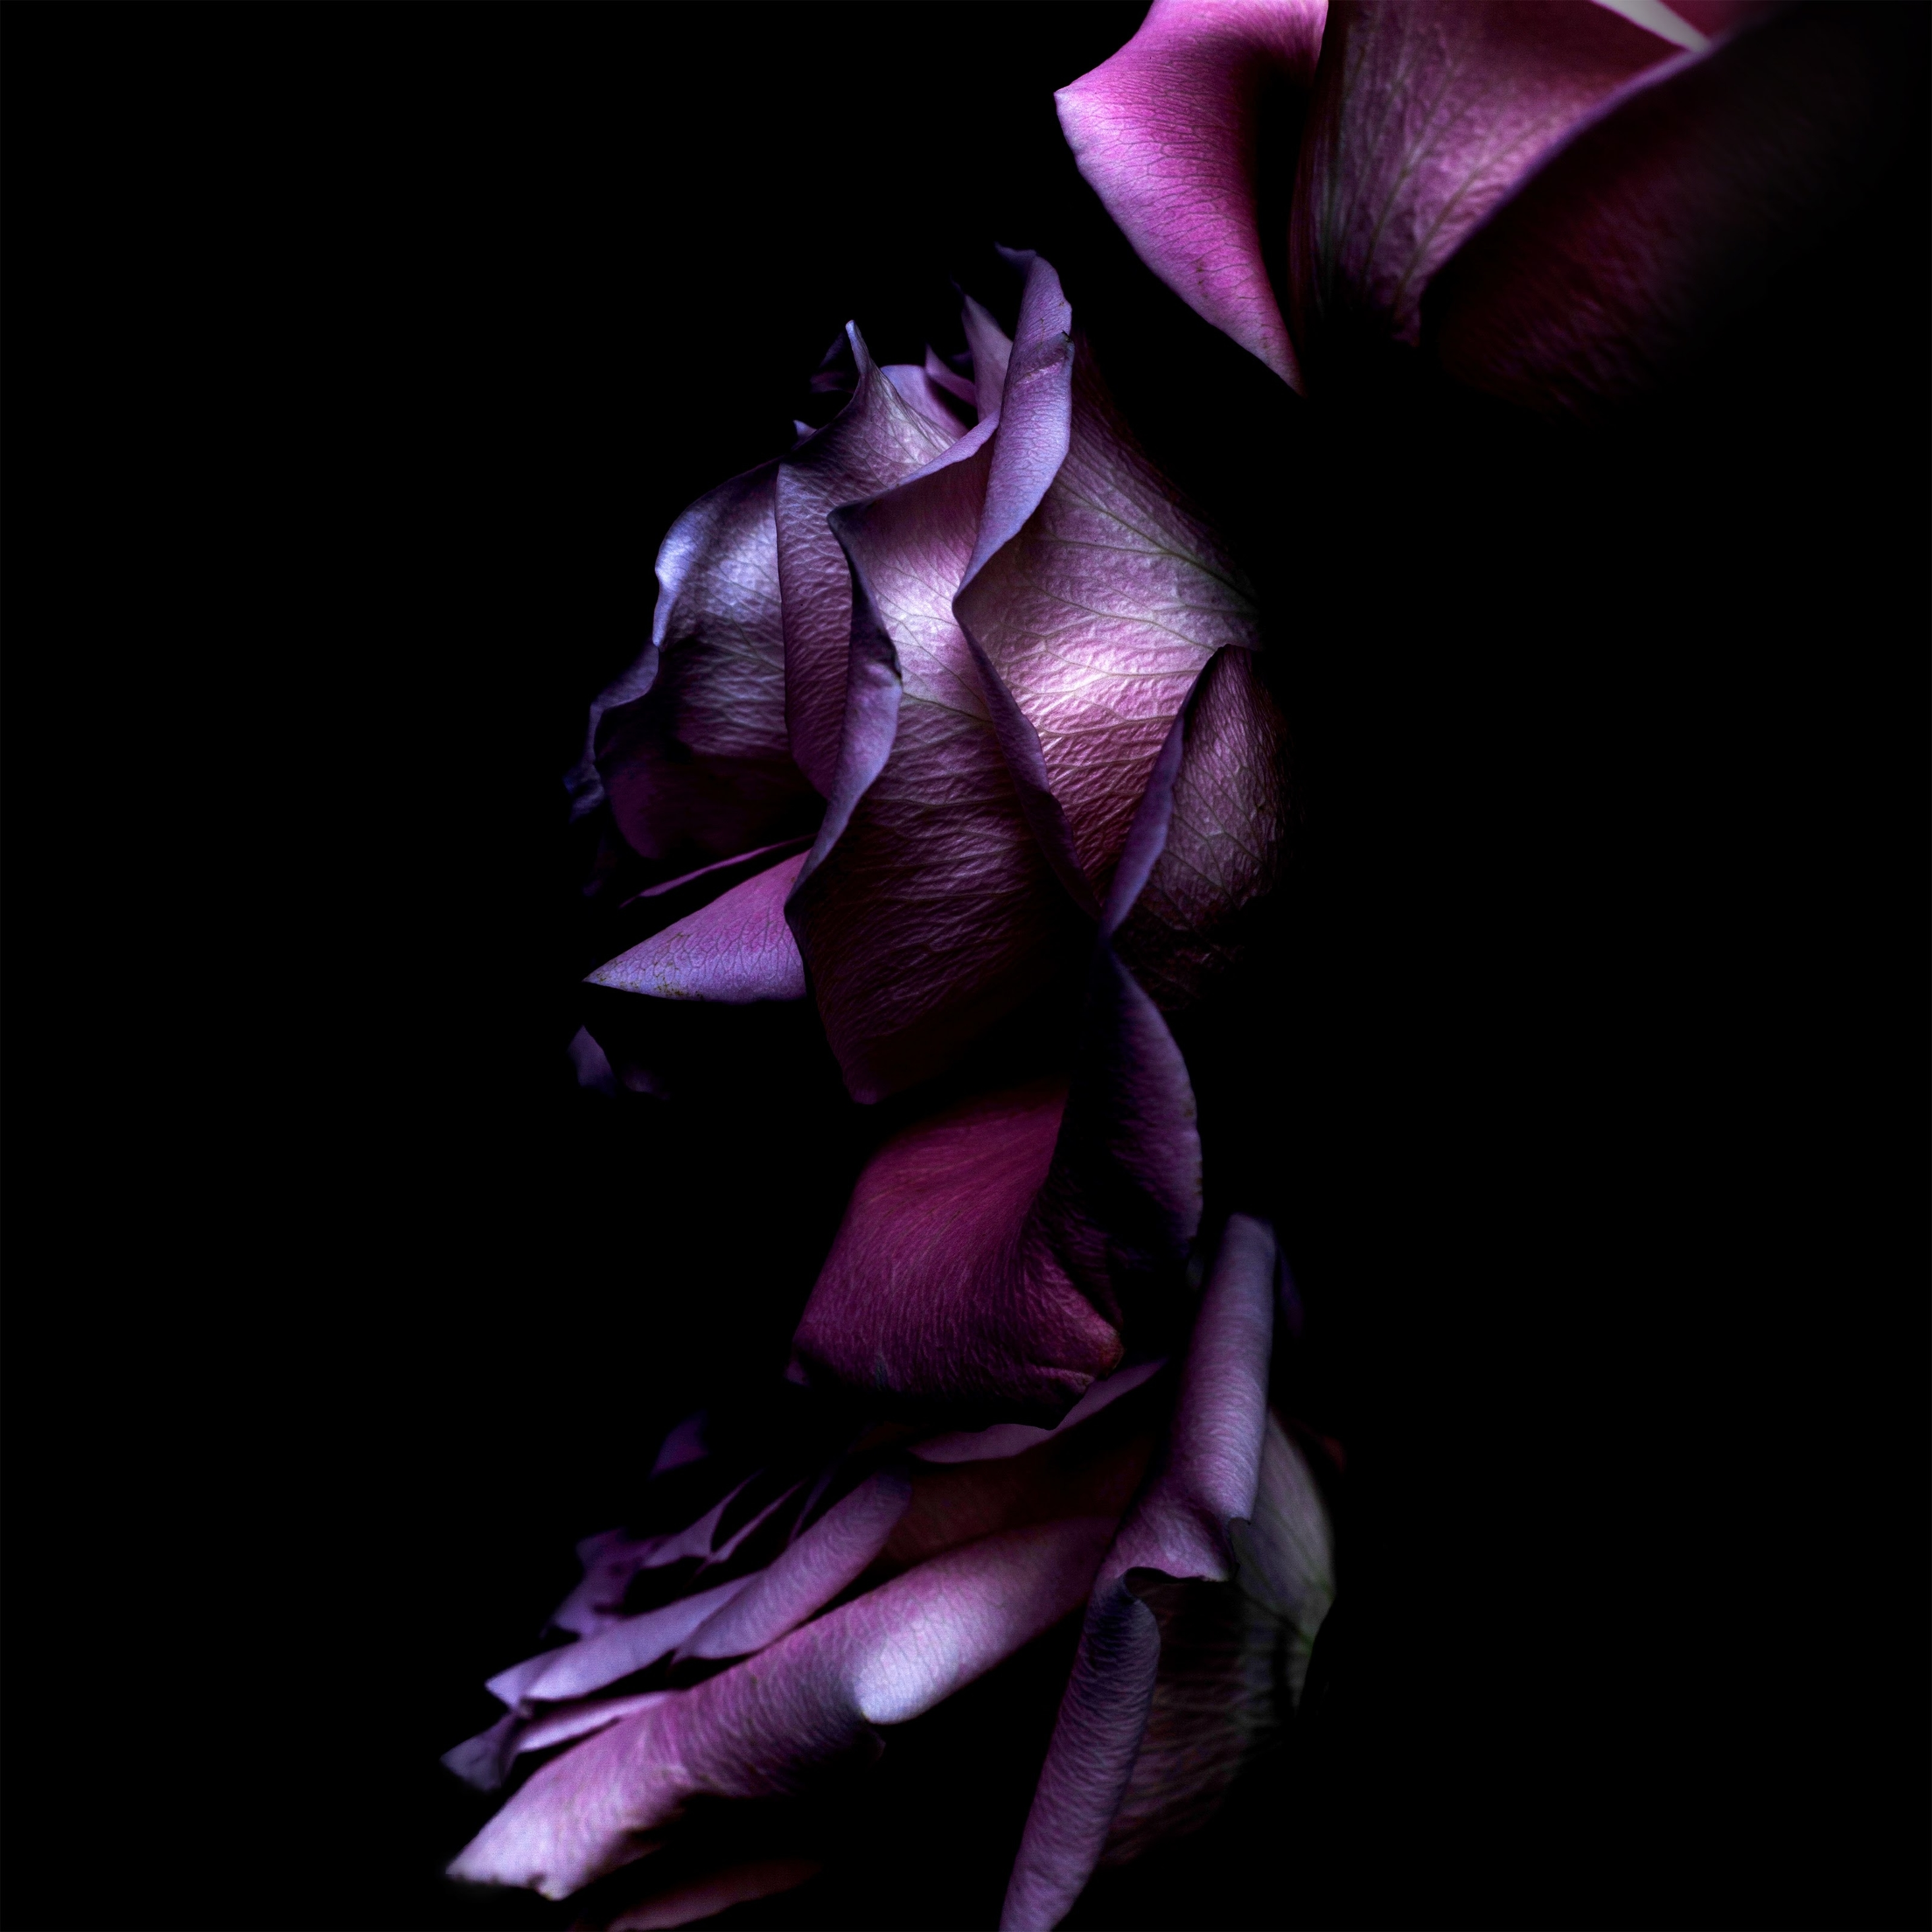 2932x2932 iOS 11 Purple Rose Ipad Pro Retina Display